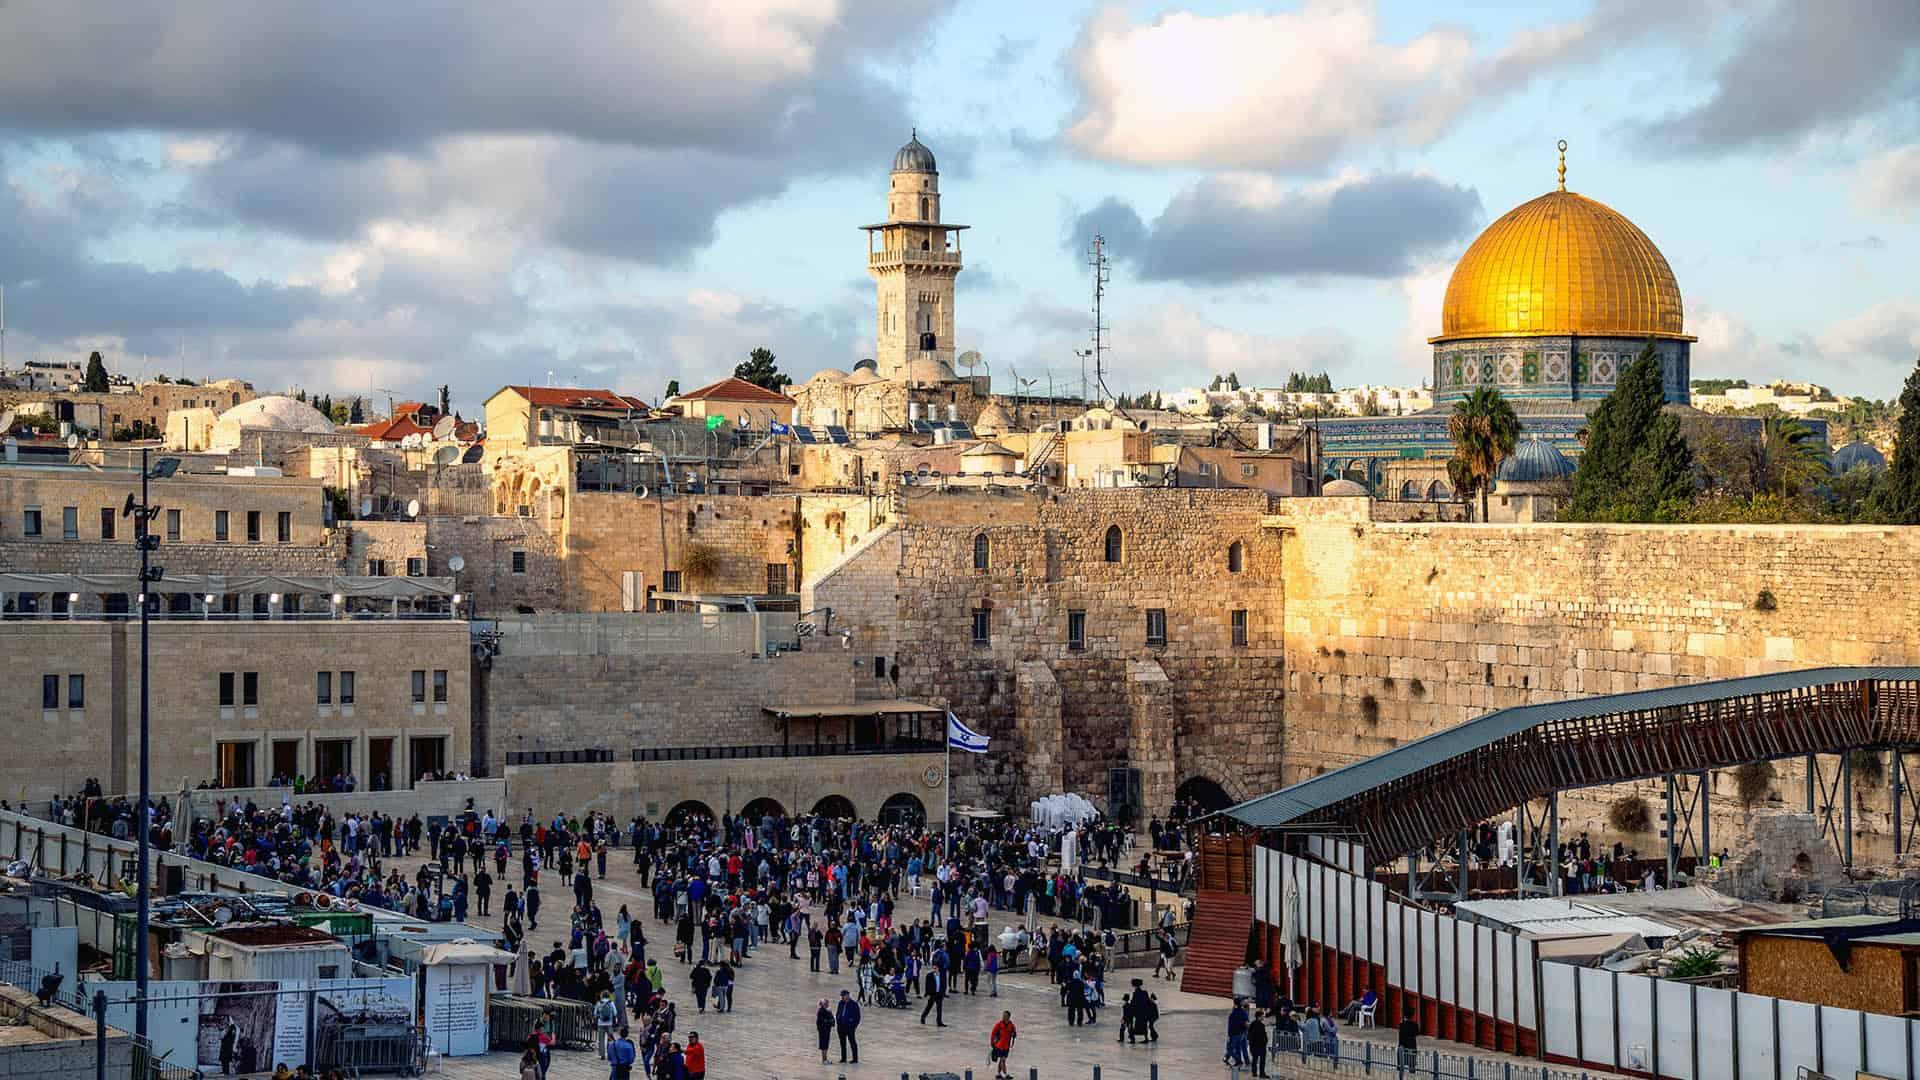 laetare-jerusalem-olv-ter-nood-heiloo